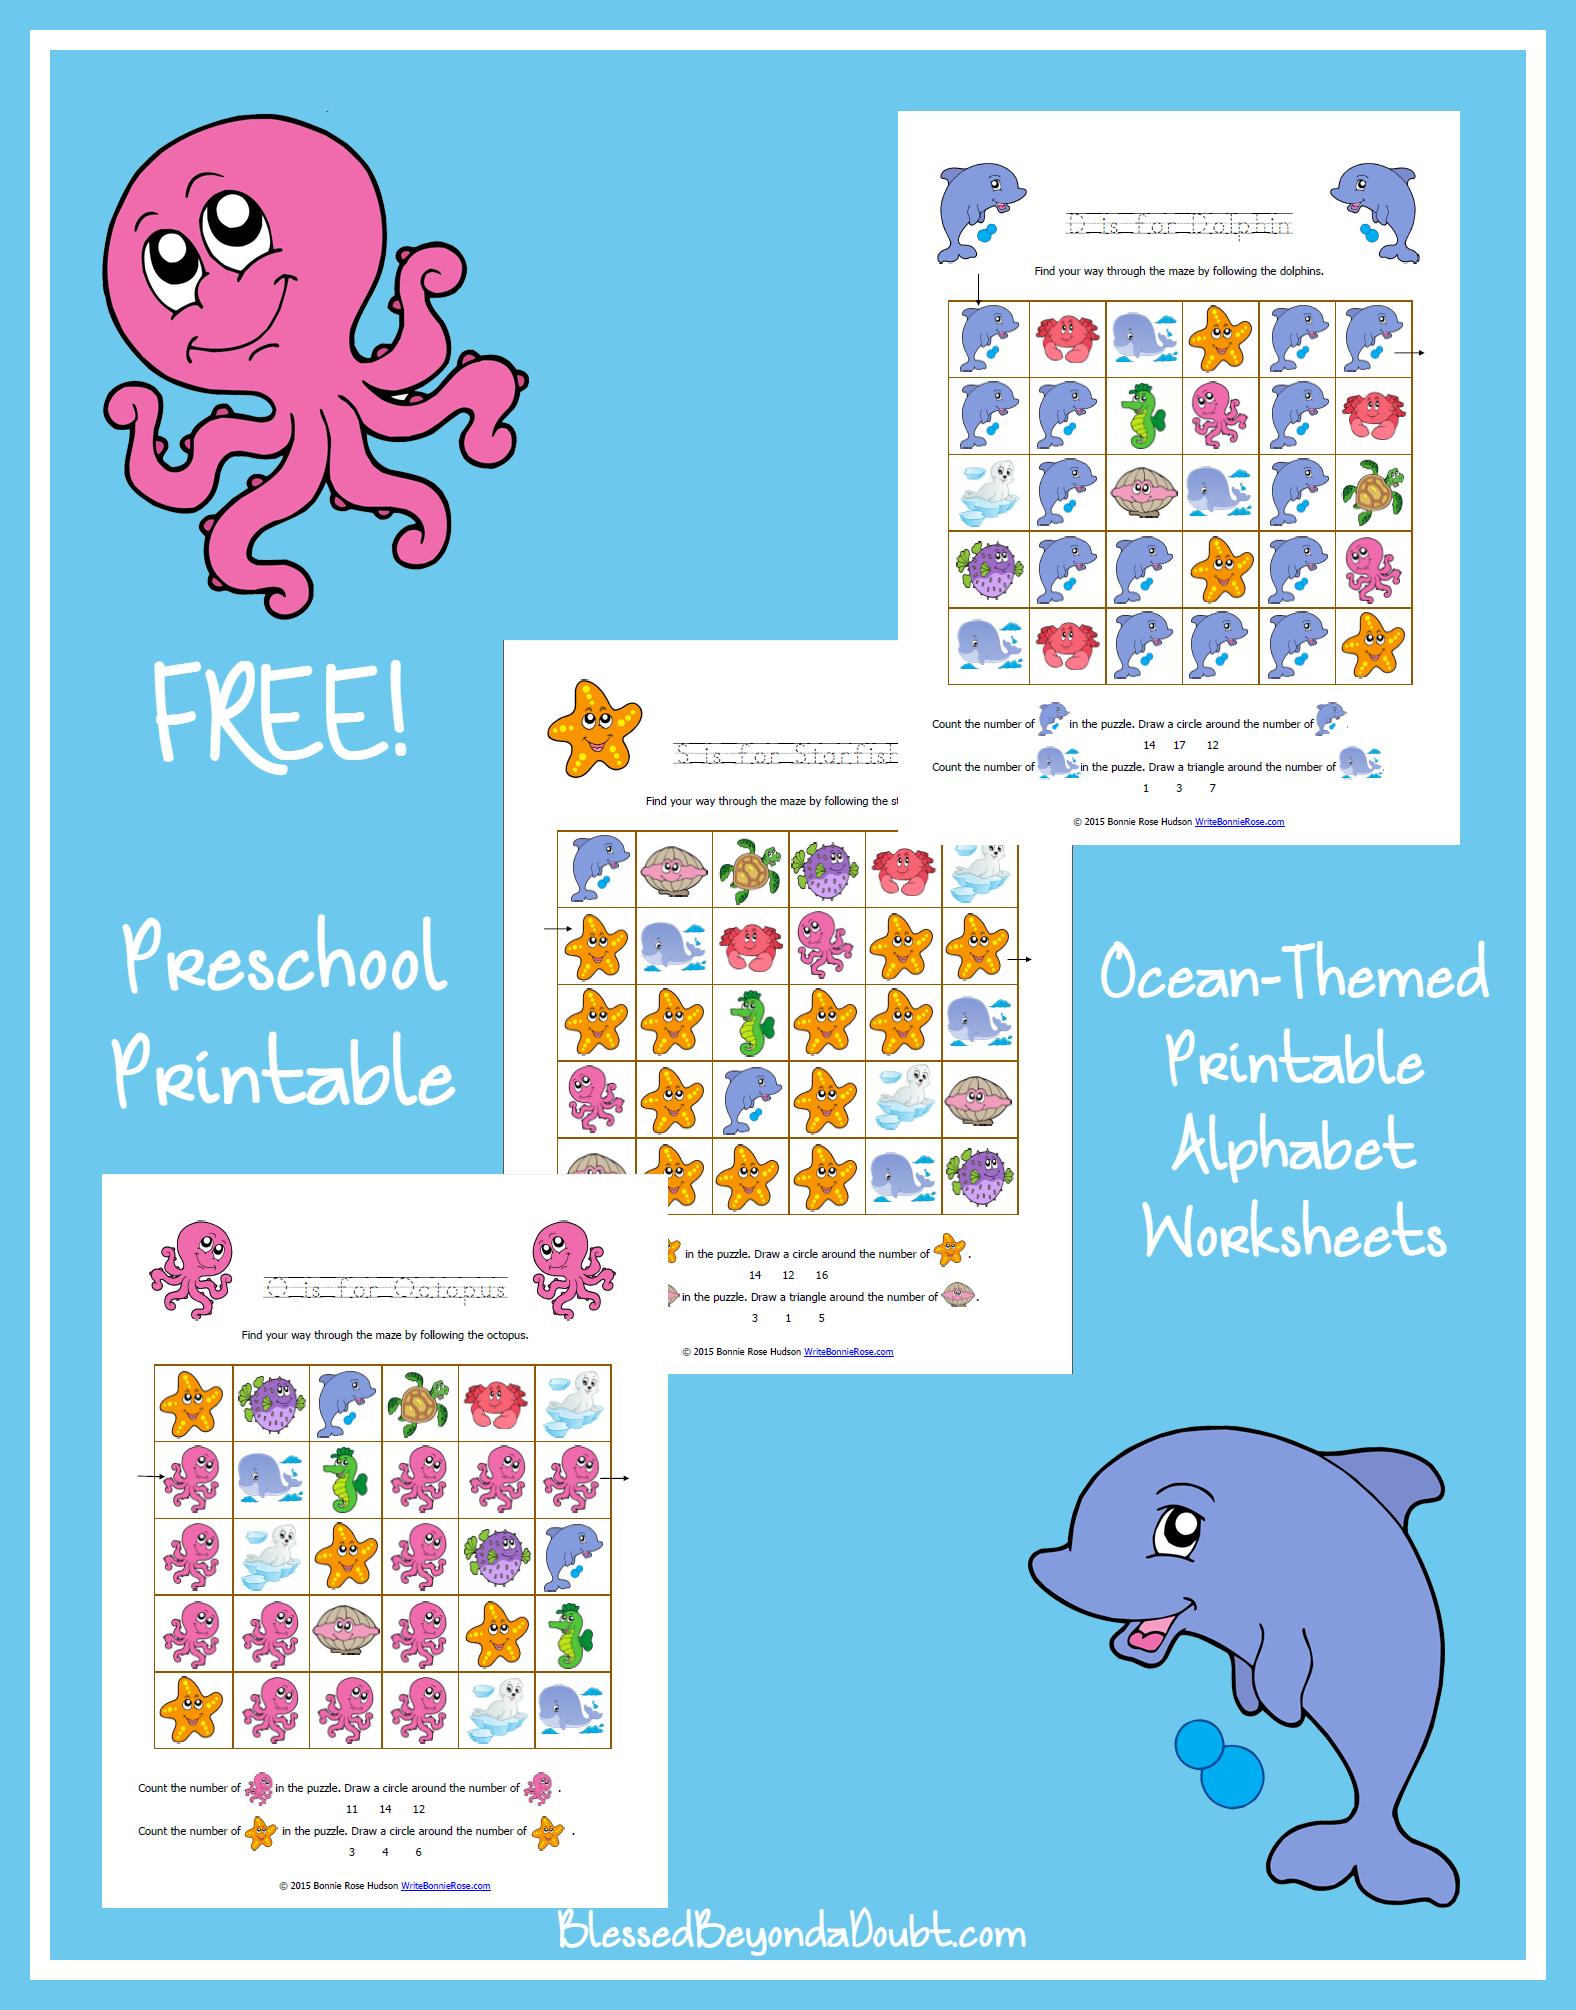 Free Ocean Themed Printable Alphabet Worksheets For Preschool